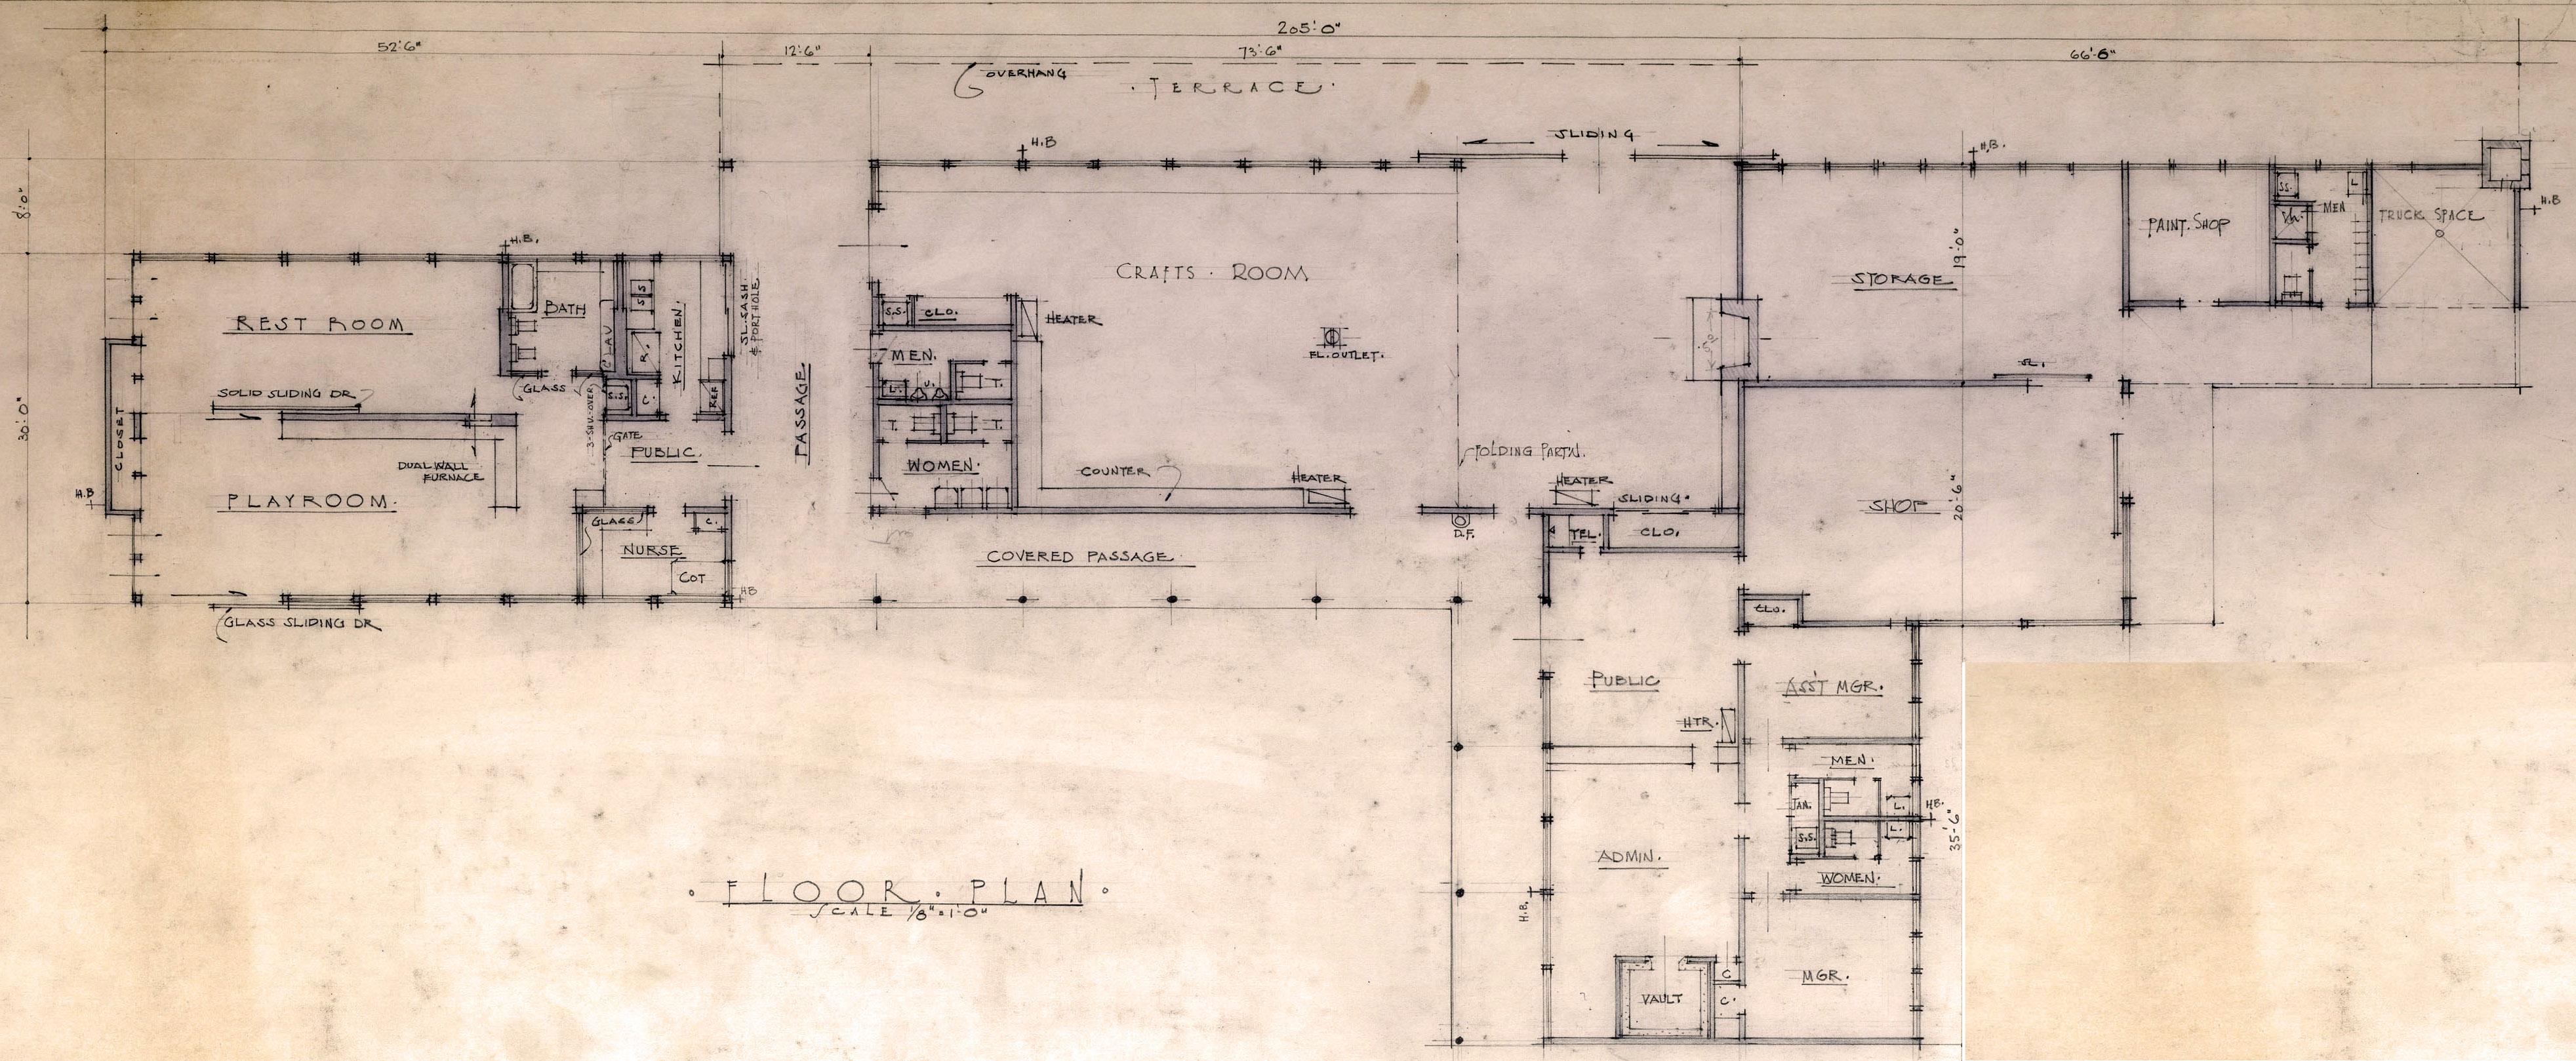 administration floor plan